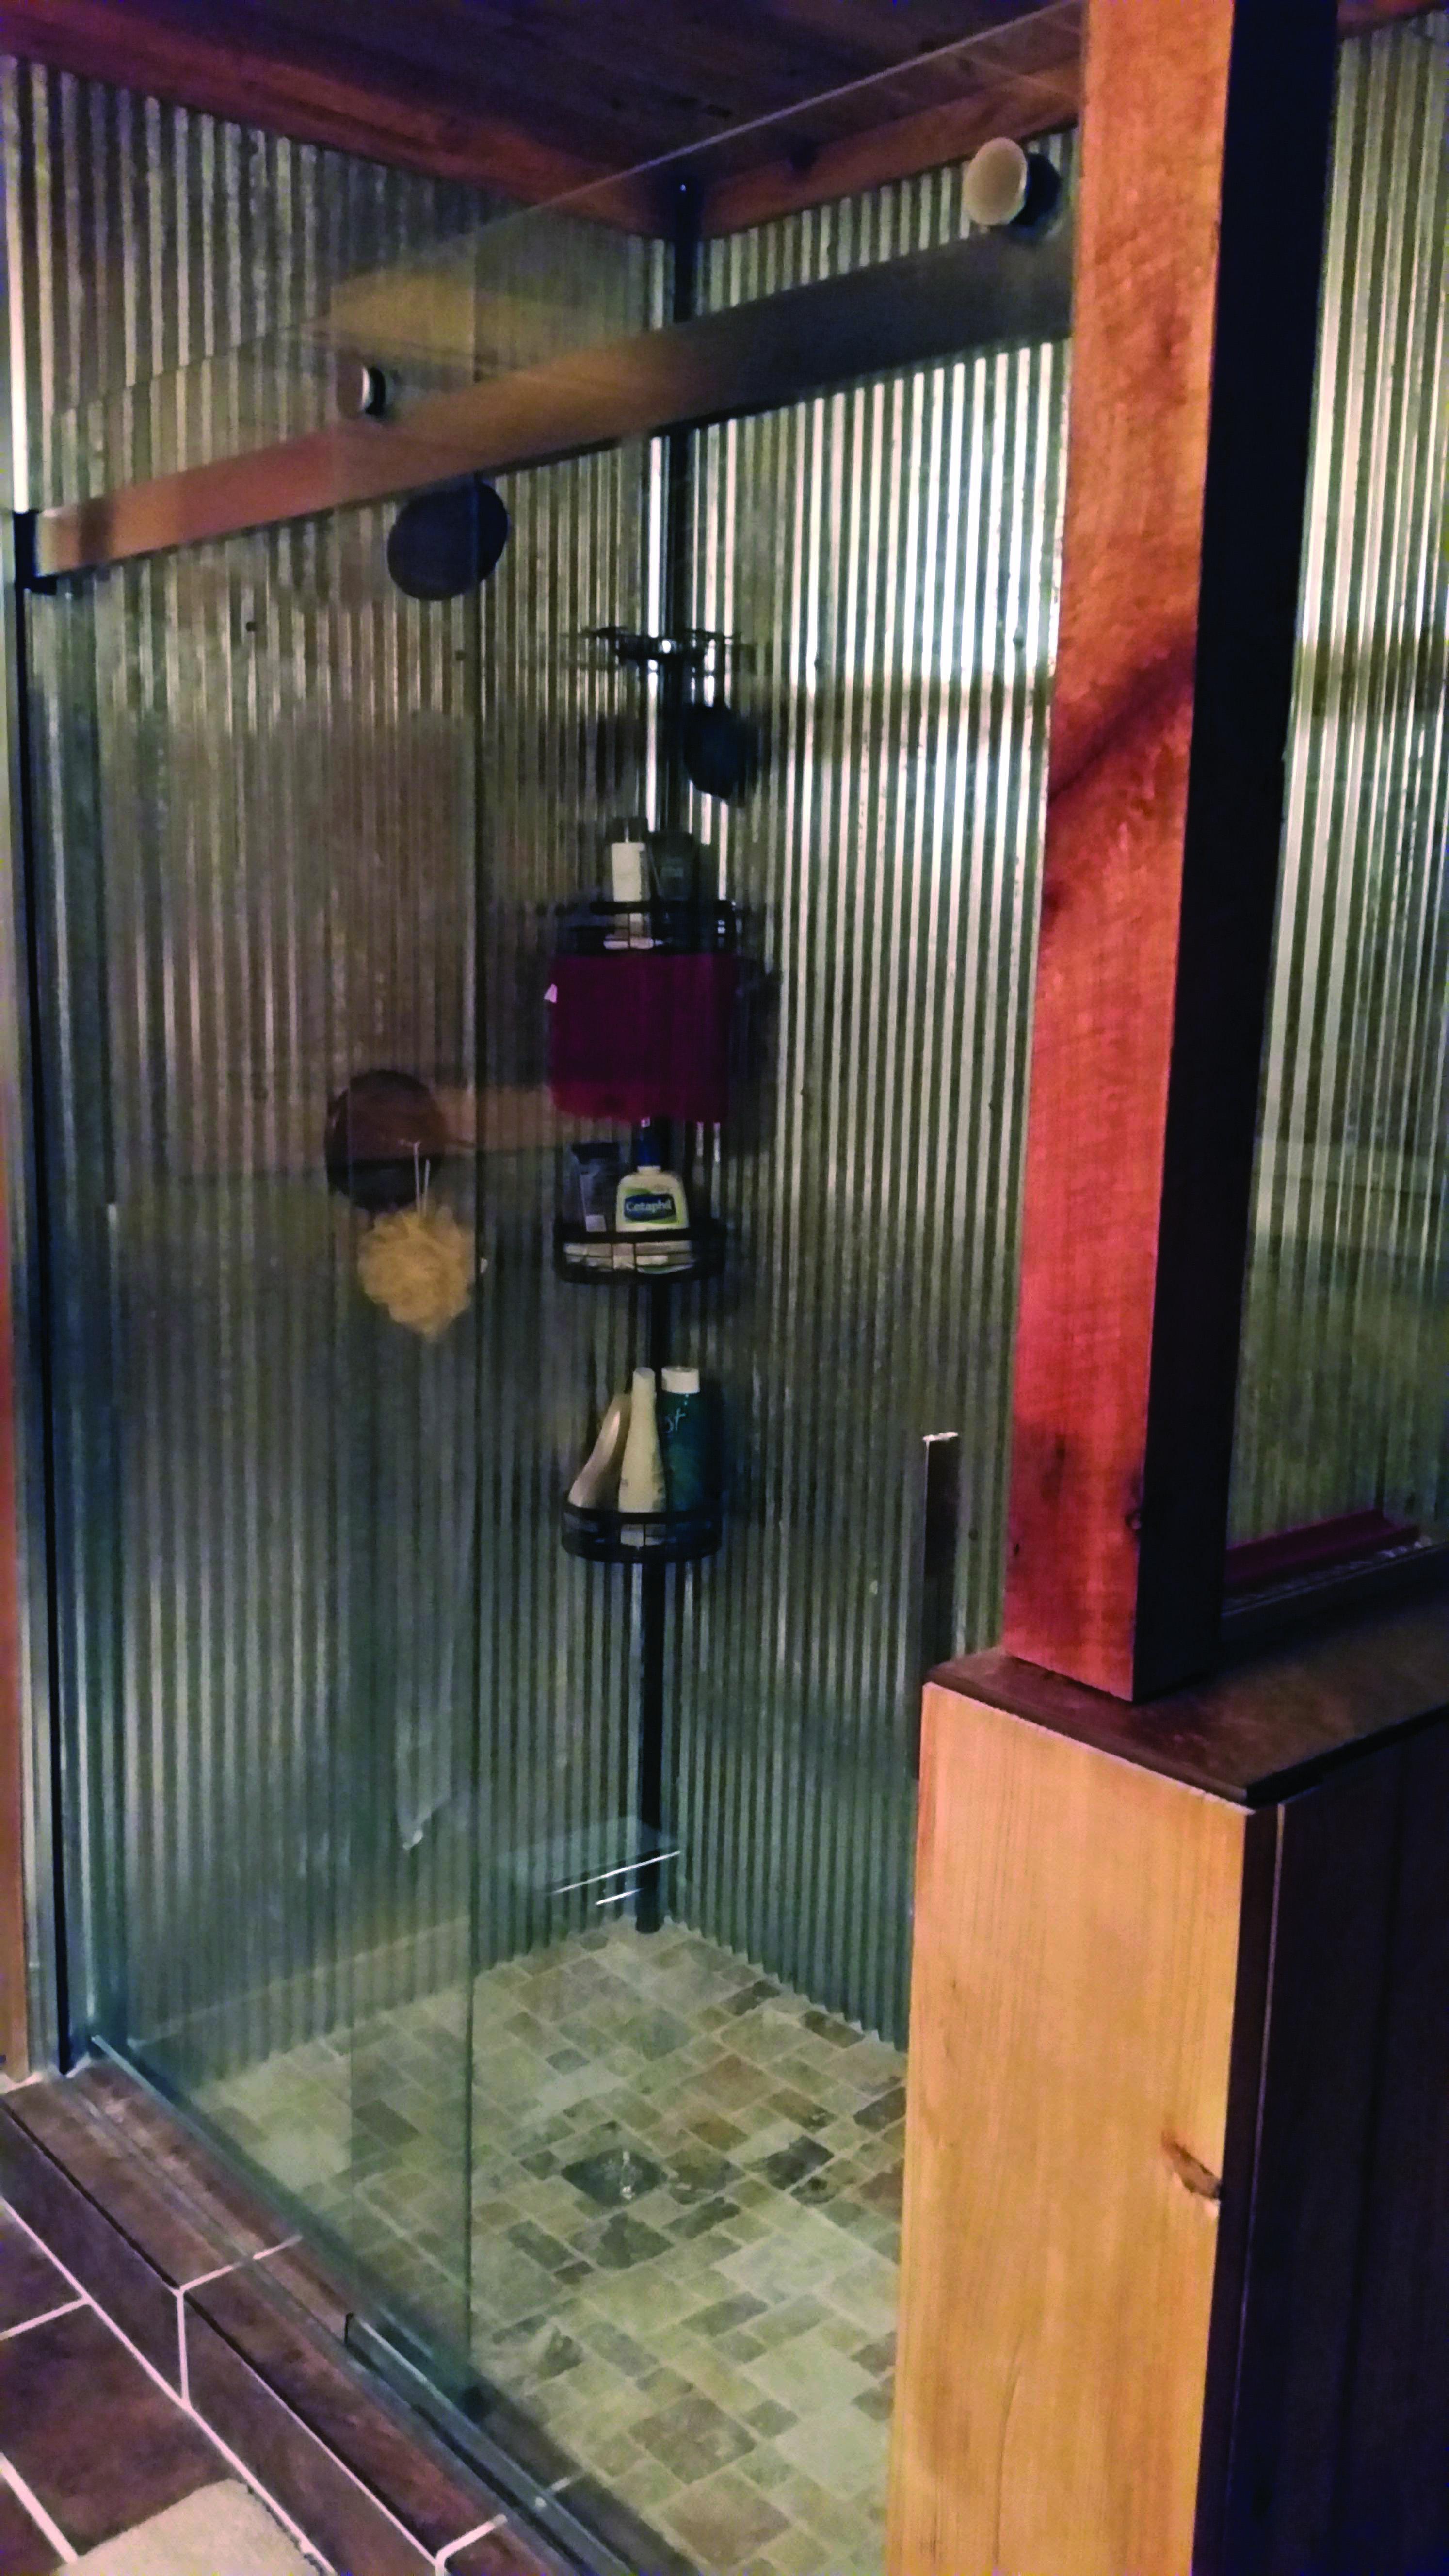 Pin By Katalin Leaird On Dream Home Idea S Barn Doors Sliding Doors Metal Barn